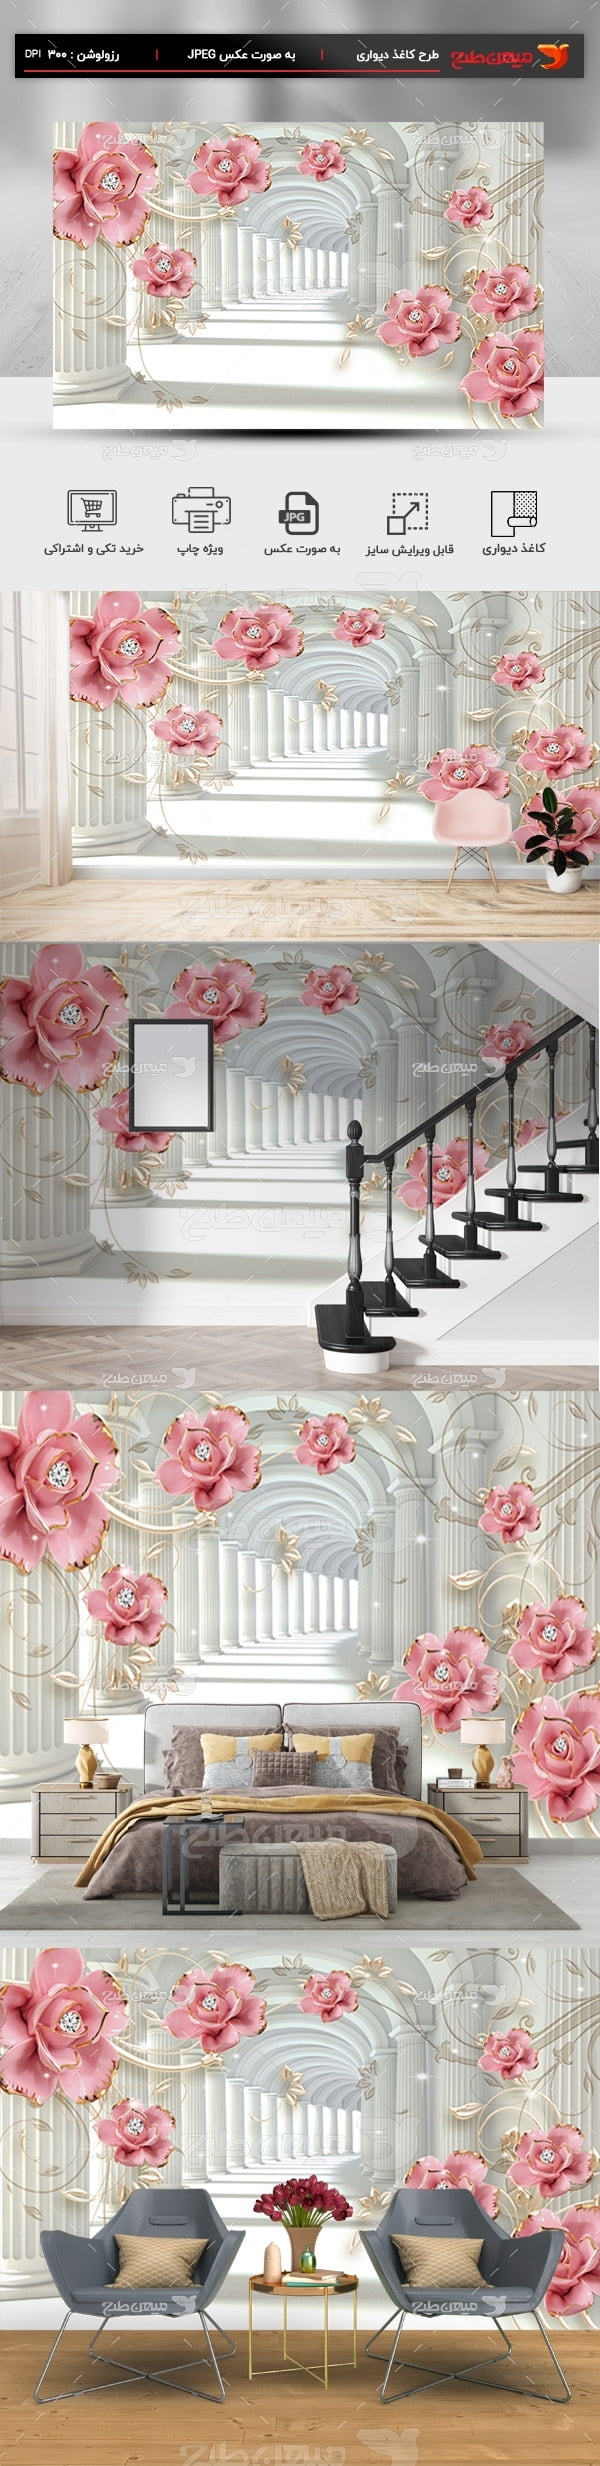 پوستر کاغذ دیواری سه بعدی ستون و گل صورتی